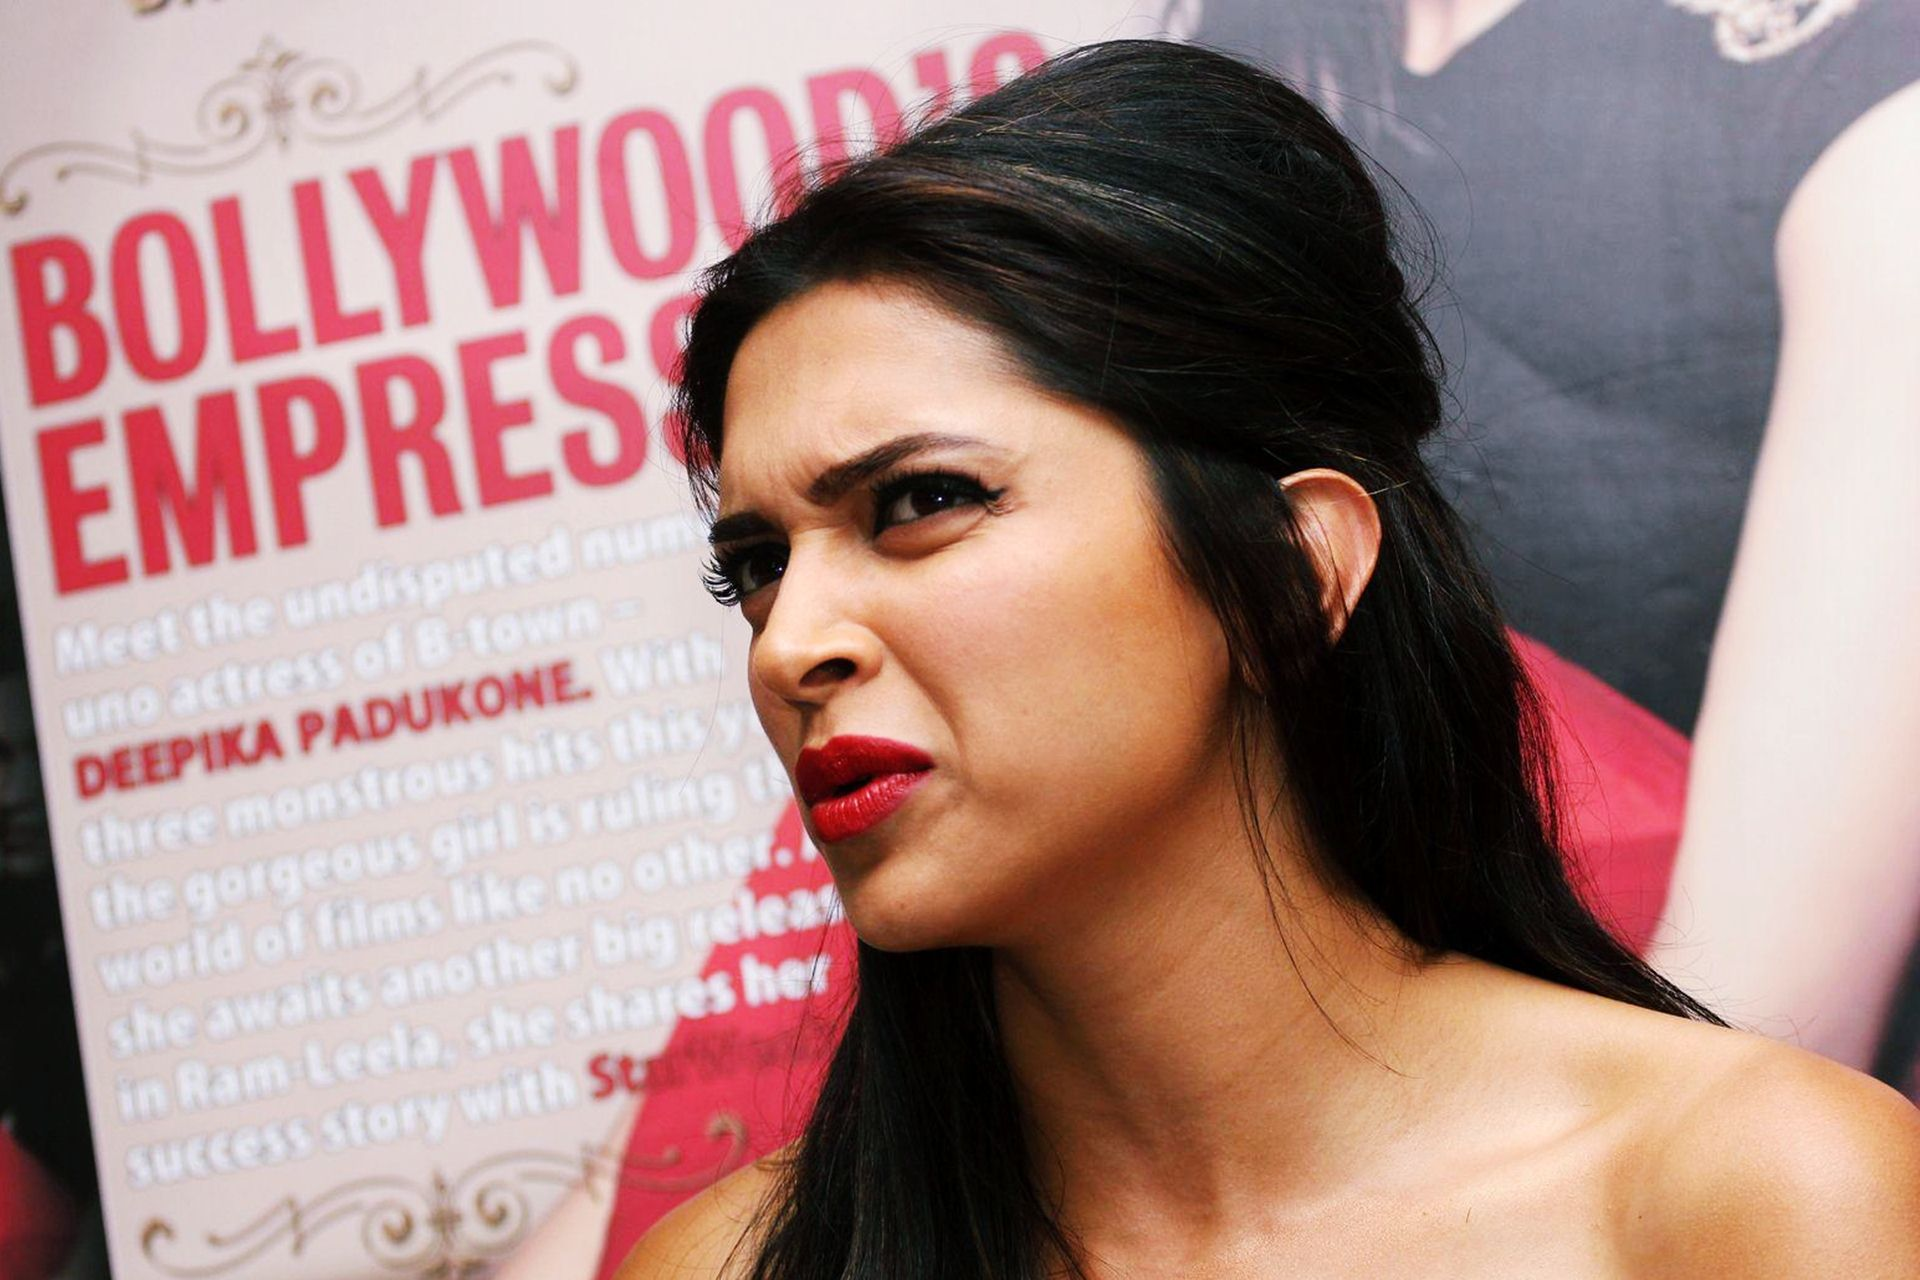 Cleavage Deepika Padukon nudes (21 photo), Tits, Hot, Twitter, cleavage 2020